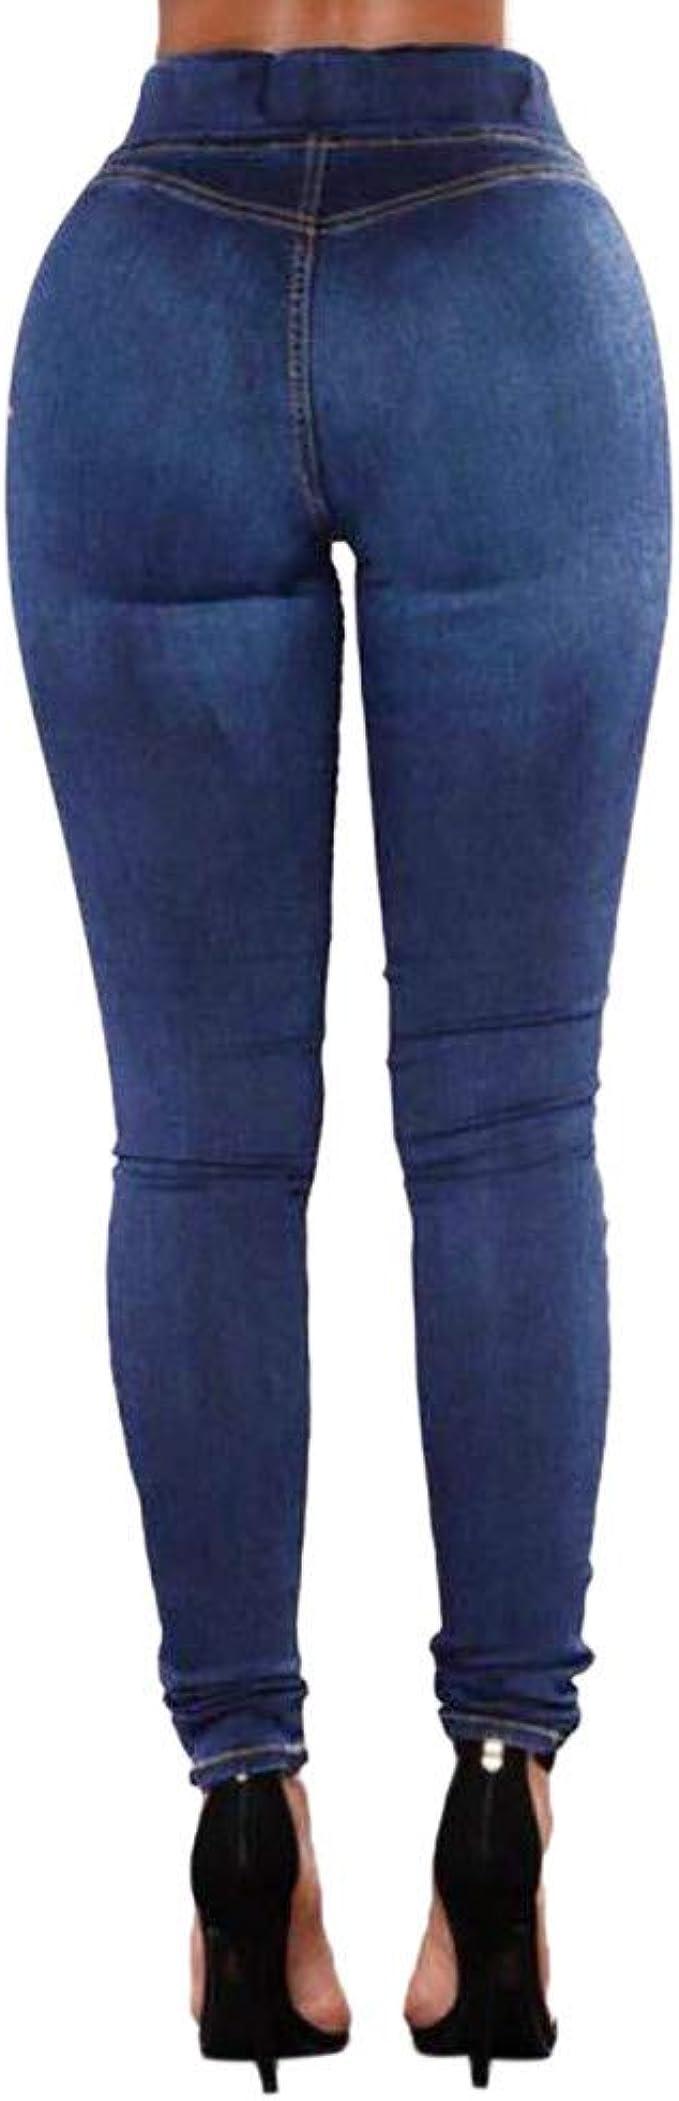 BLACK Women PantsGabardine Fabric High Waist TrousersTight-fitting PantsSkinny Stretch12 ColoursComfortable Lycra Pants with Pockets